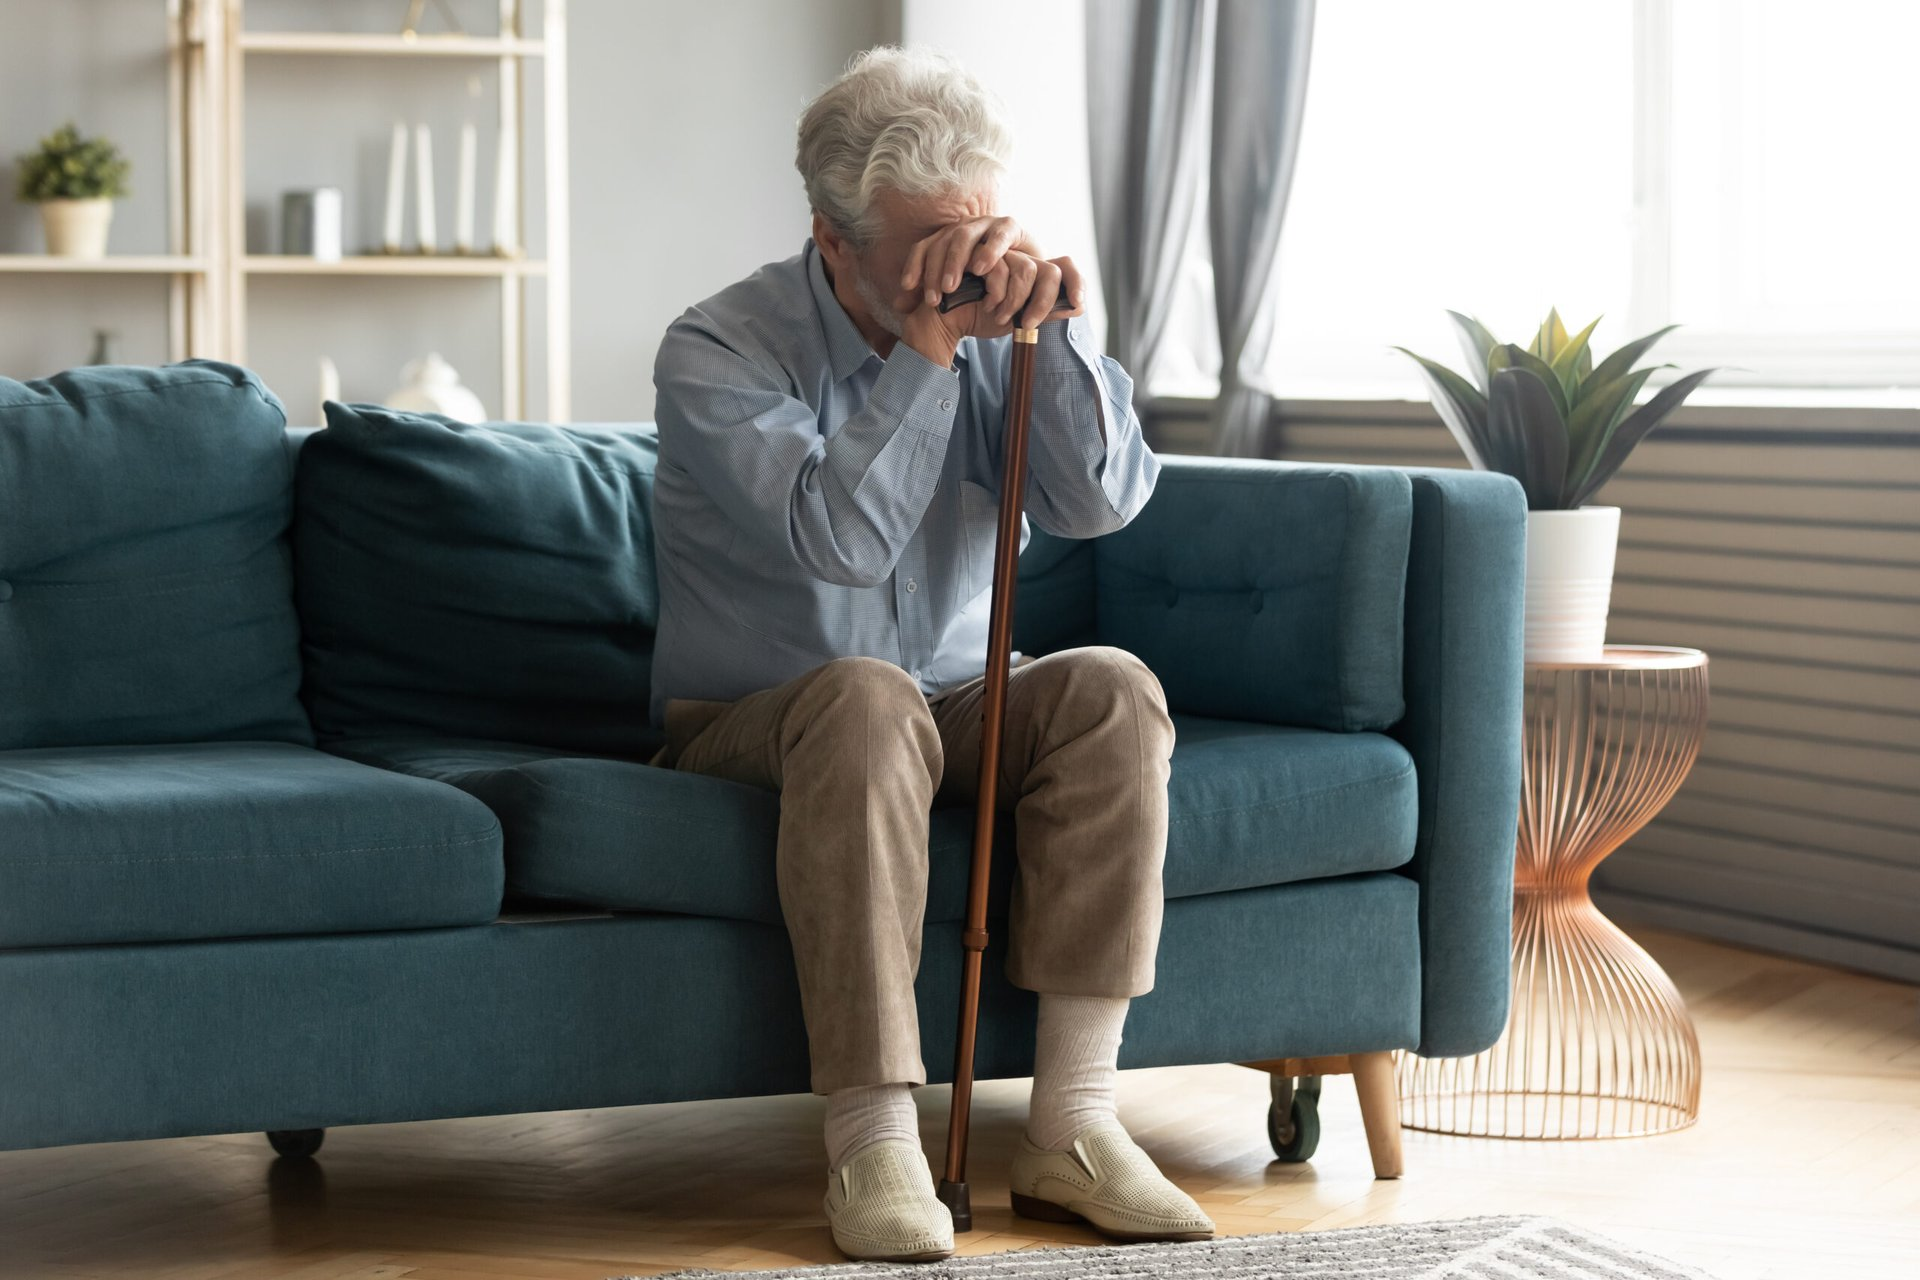 Worried senior holding a cane